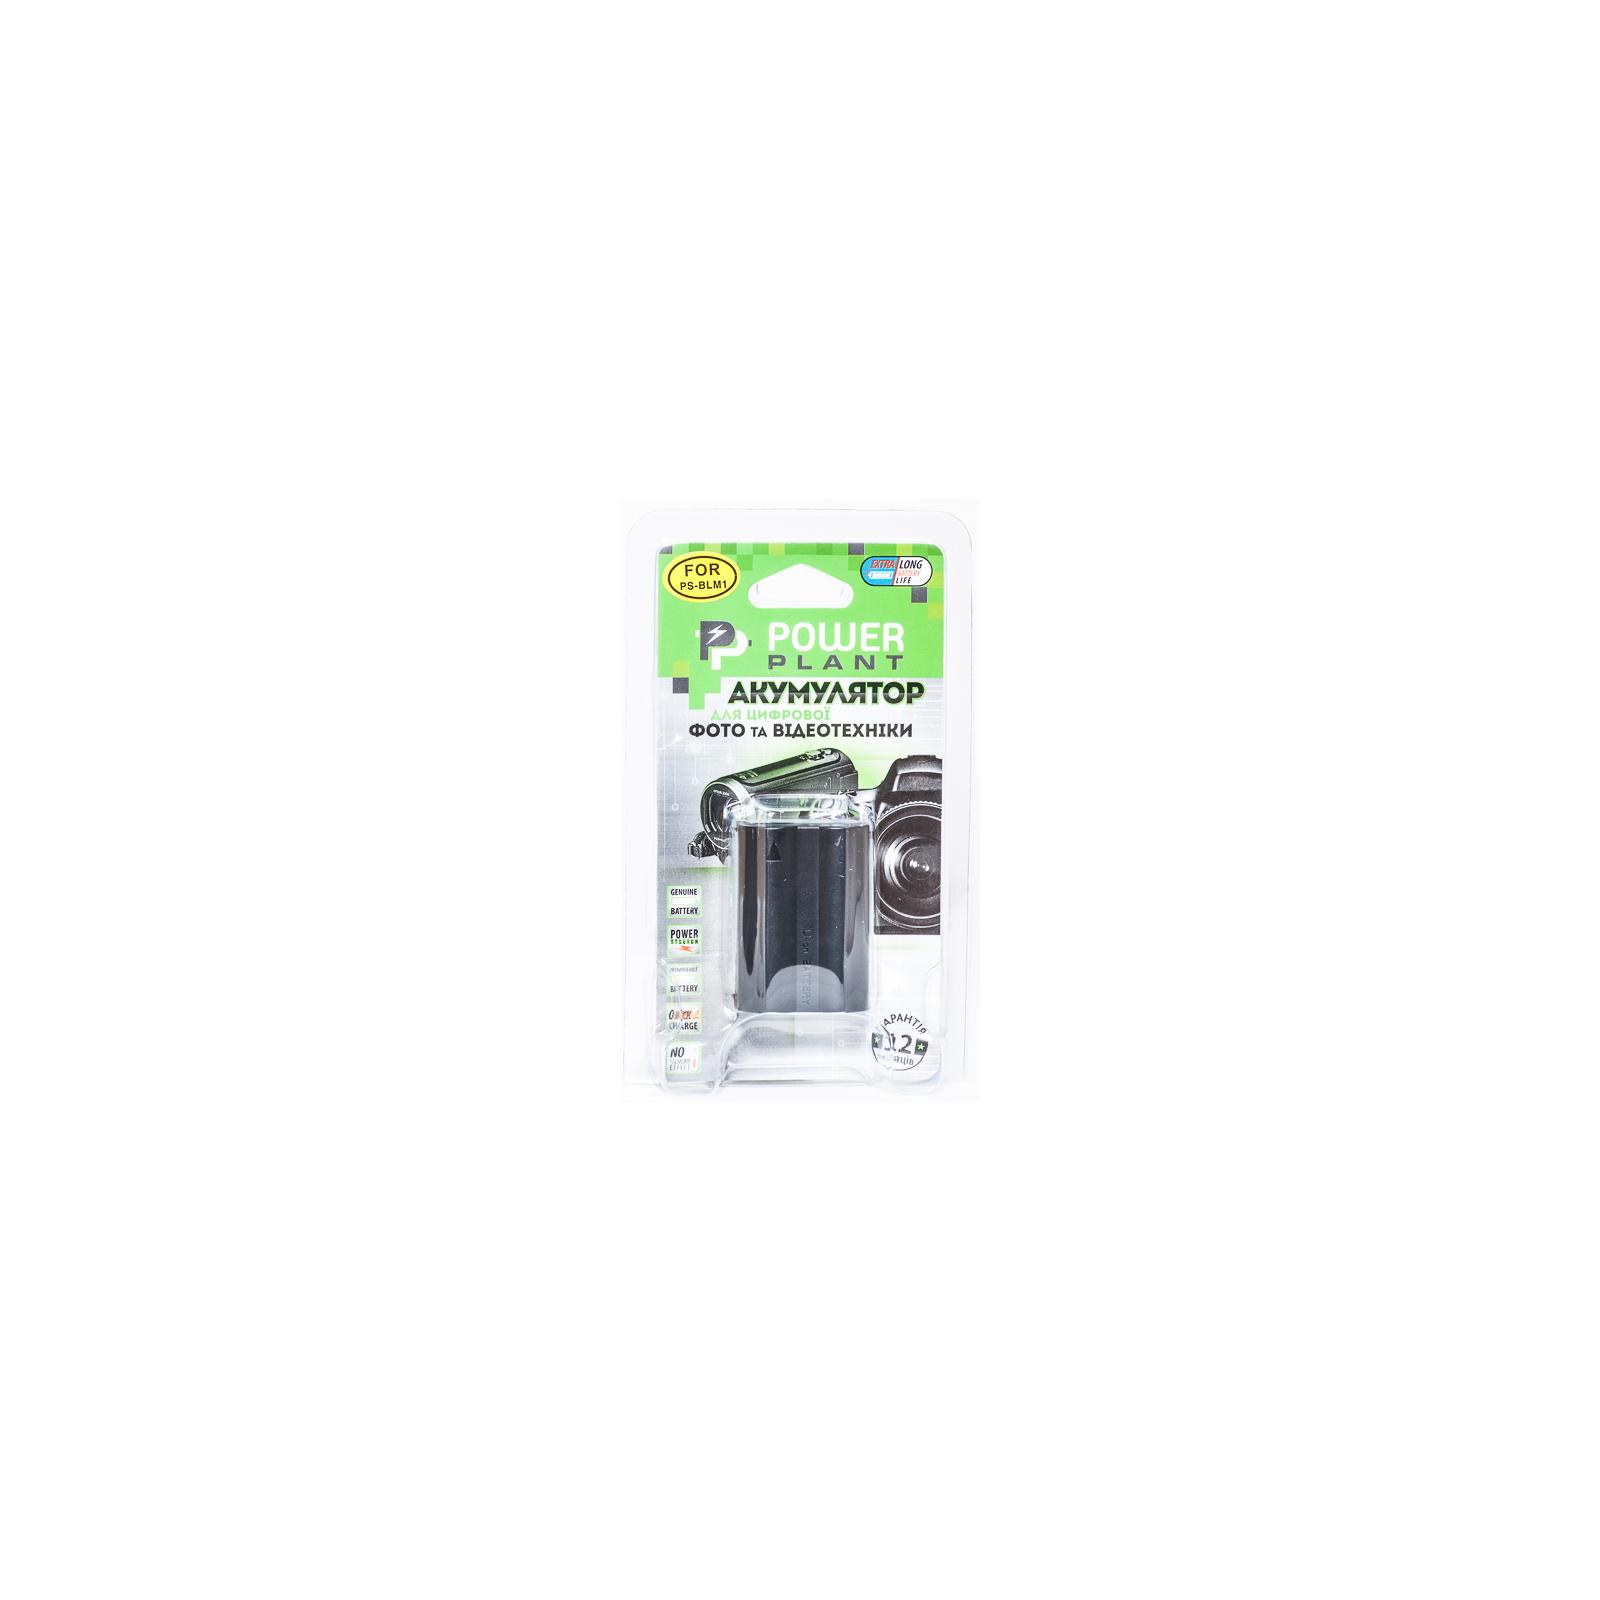 Аккумулятор к фото/видео PowerPlant Olympus PS-BLM1 (DV00DV1057) изображение 3